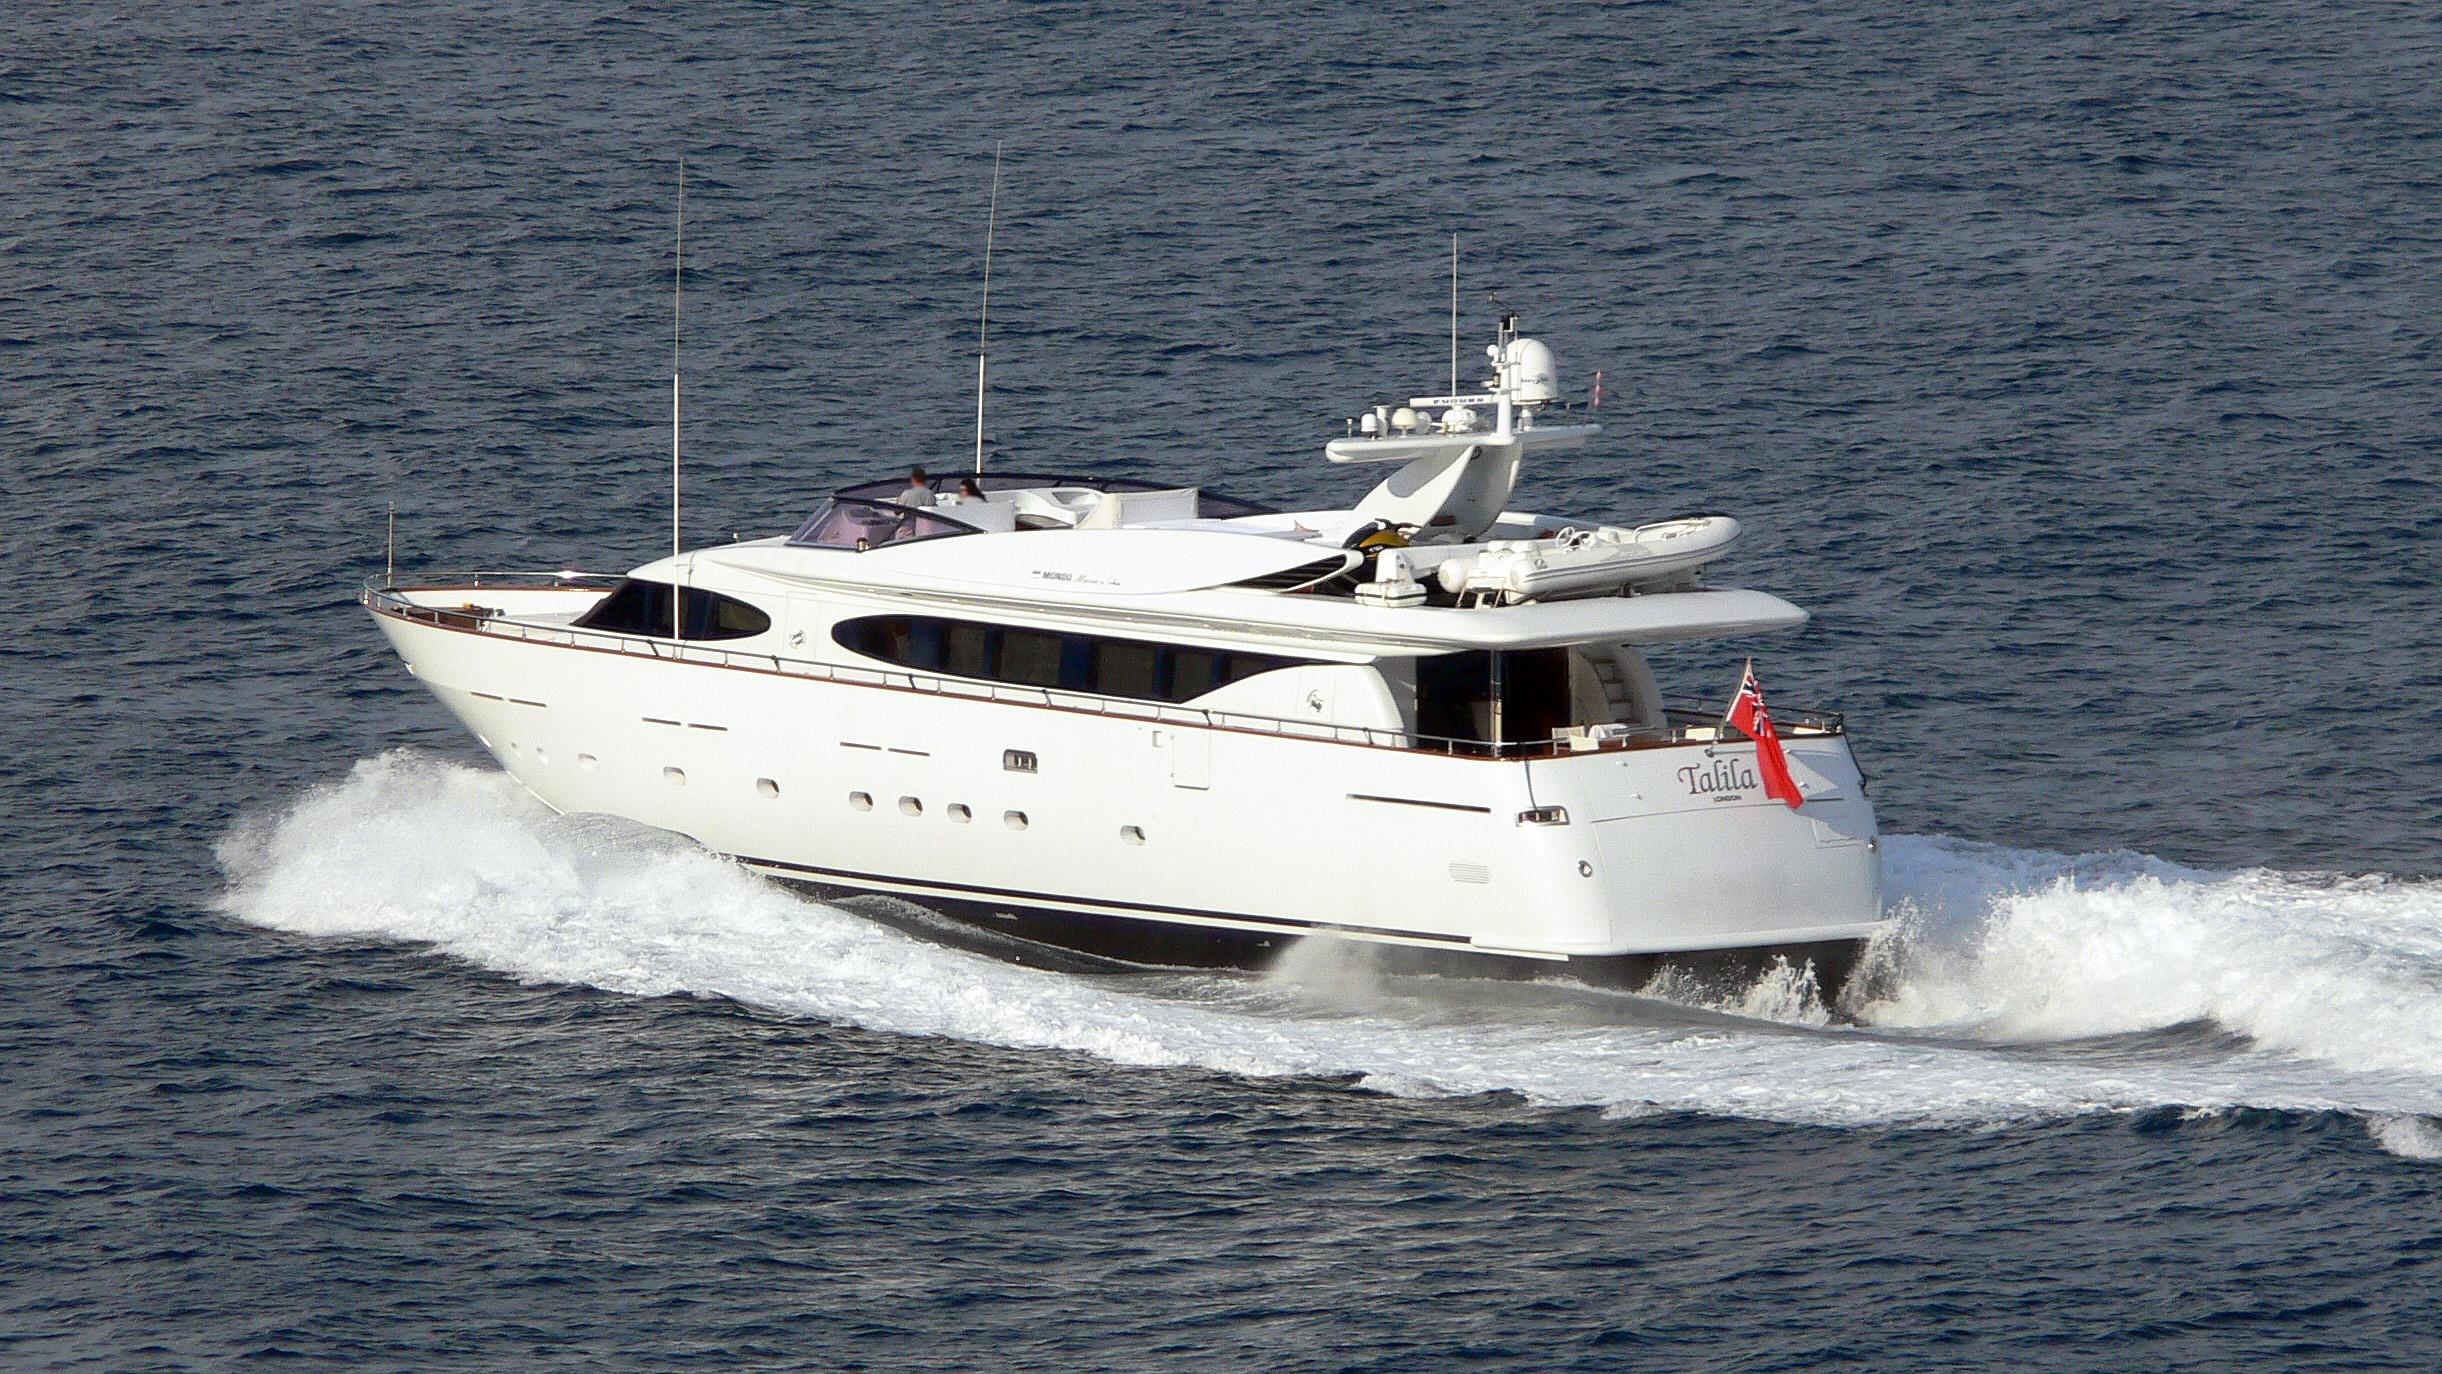 talila-motor-yacht-mondomarine-mondo-29m-2000-28m-cruising-stern